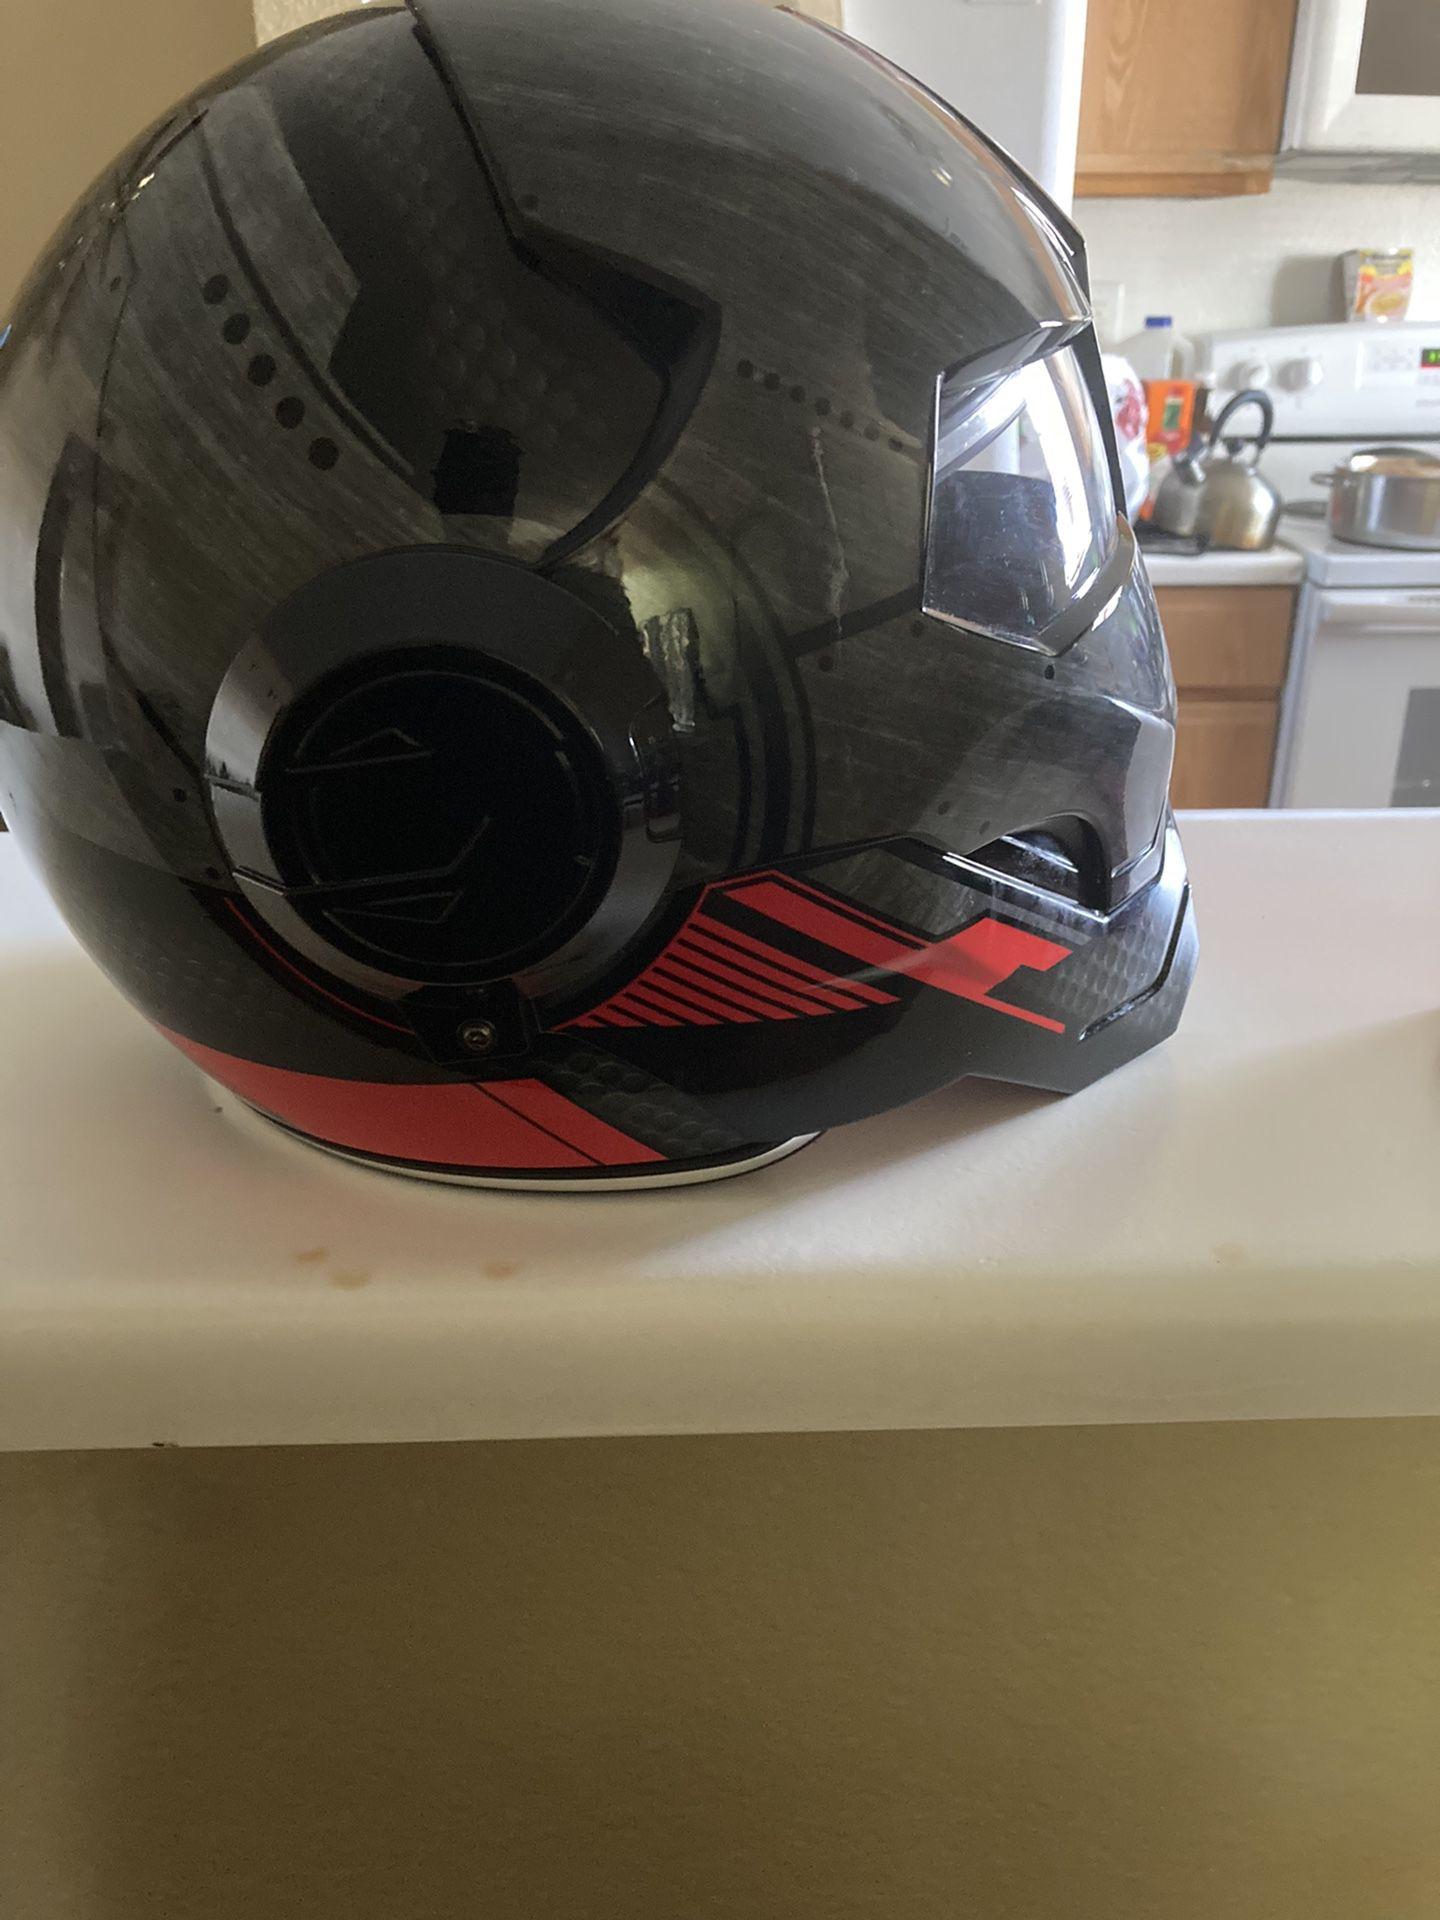 Helmet Still New Botha Of Them Never Use  280 For Boths